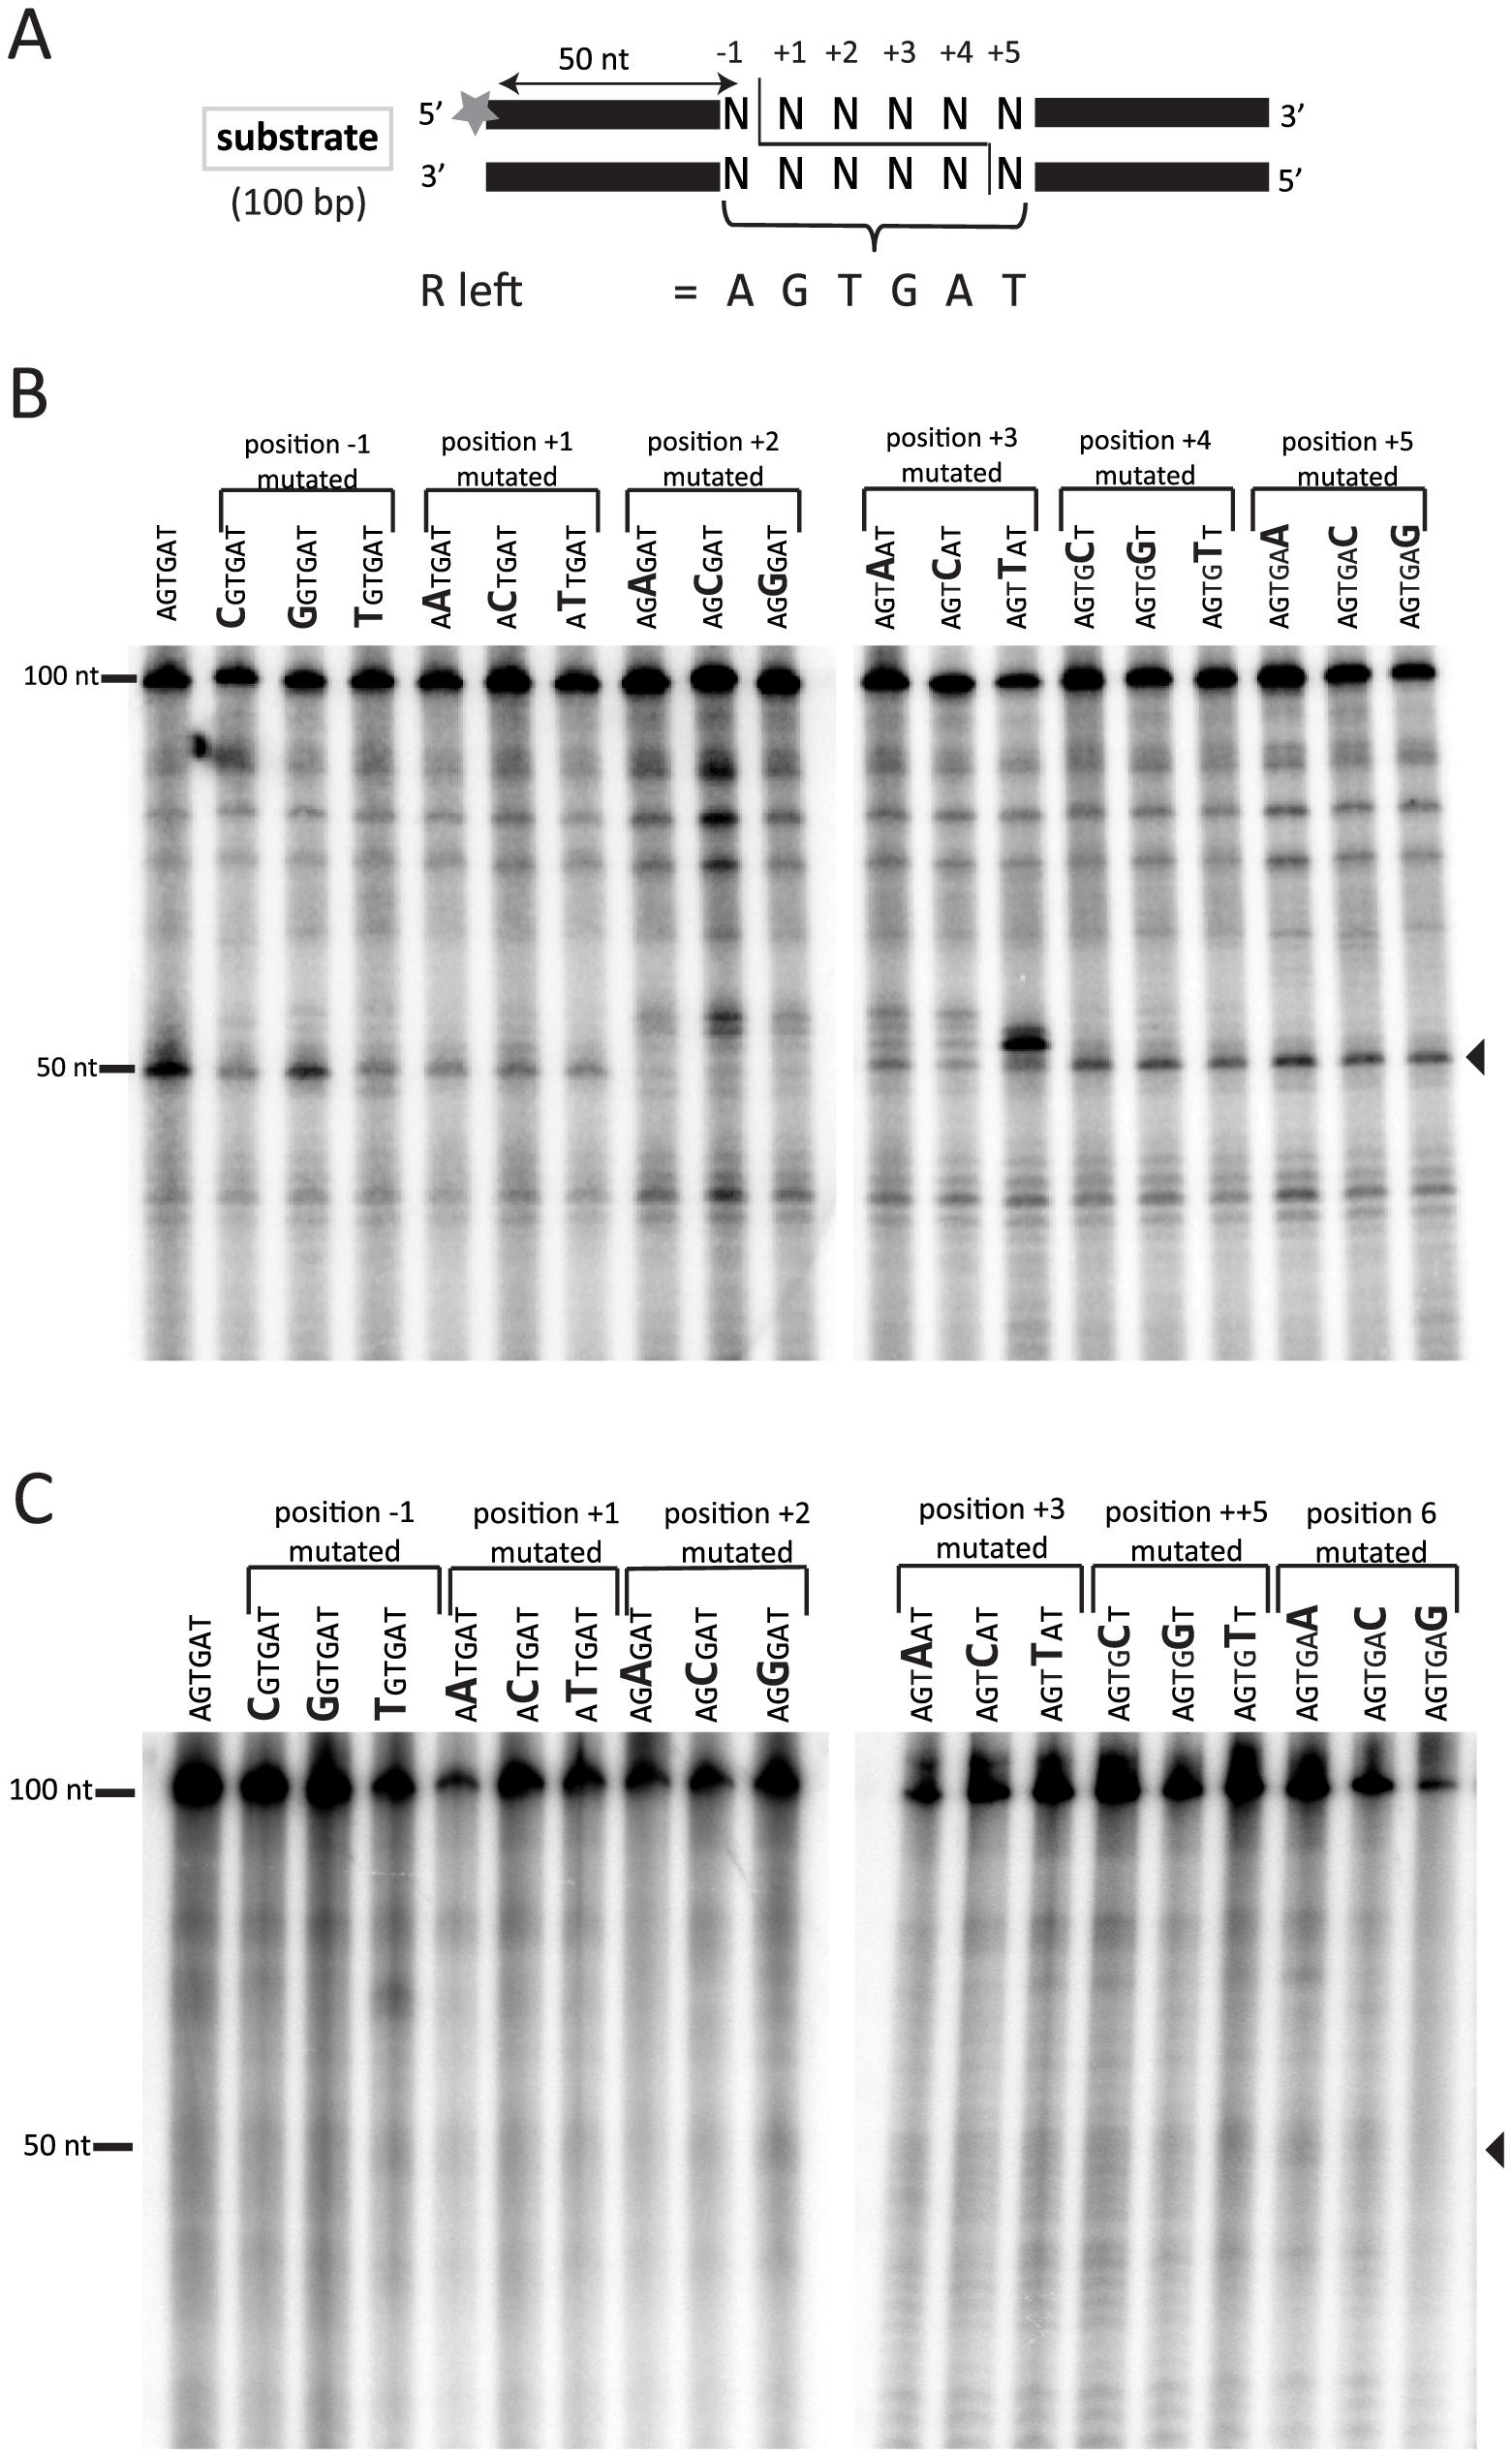 In vitro Tpb2p endonuclease assay.